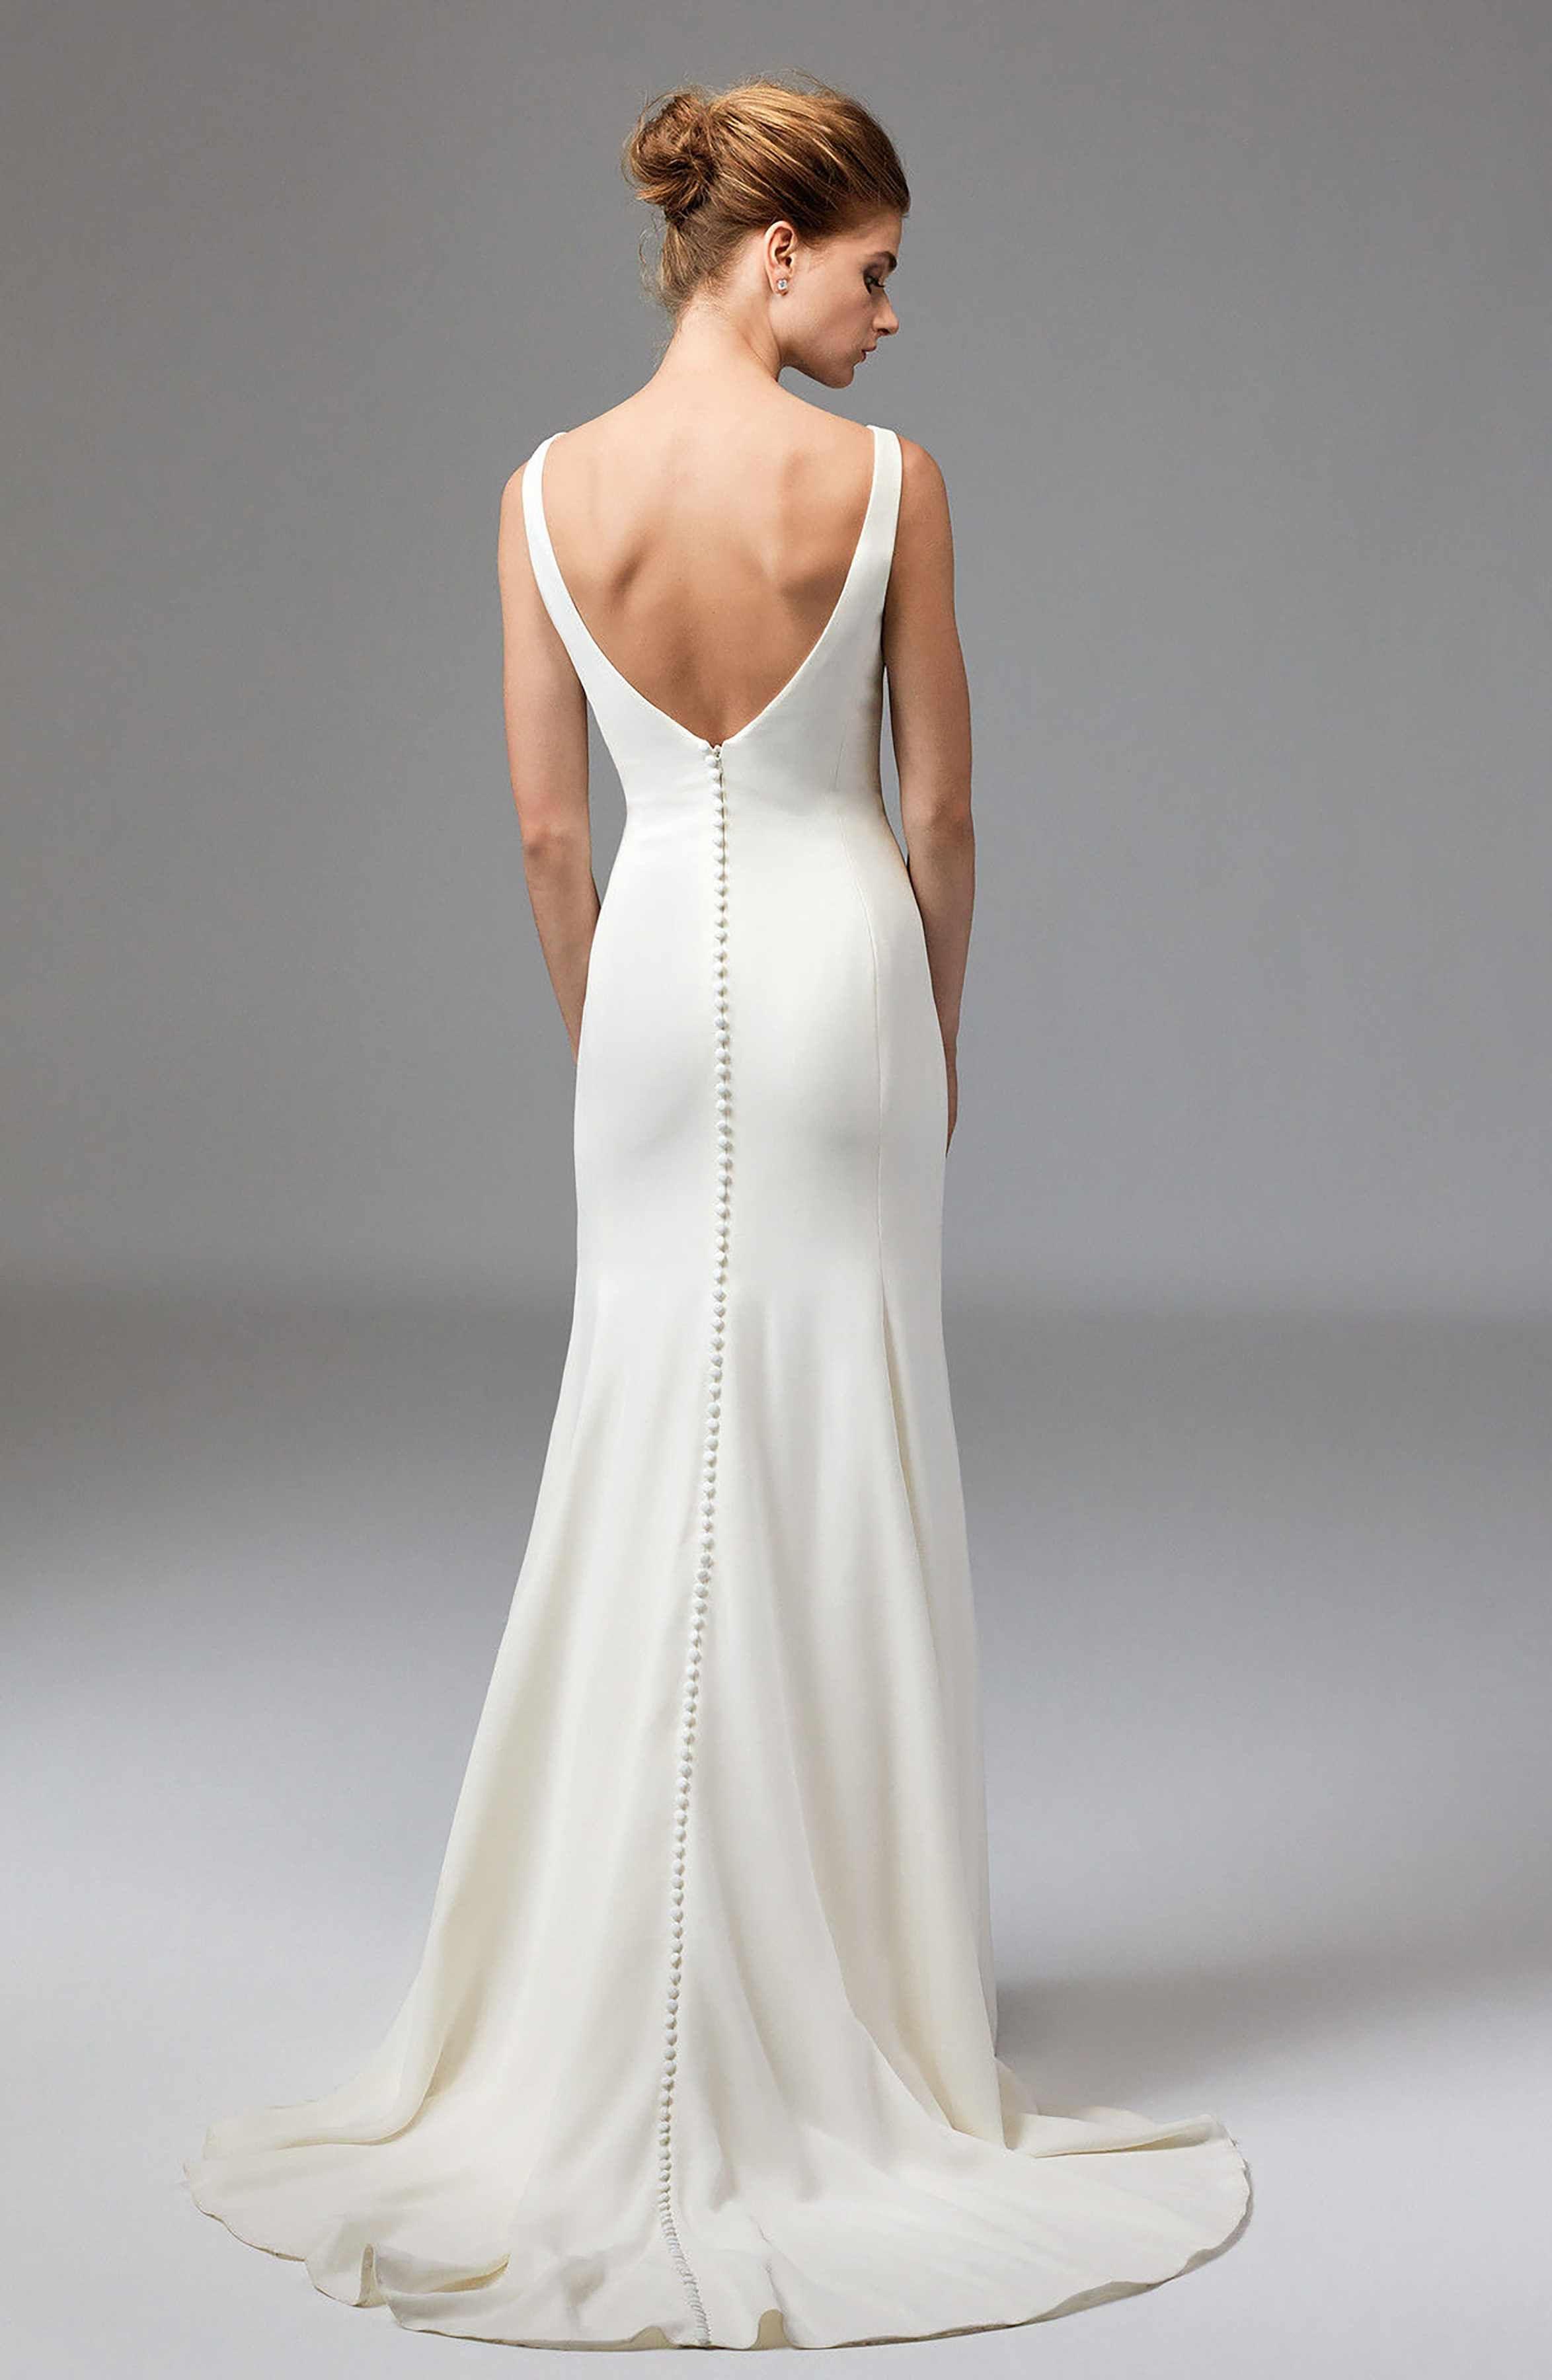 Romona keveza lace wedding dress october 2018 Main Image  Watters Leona Sleeveless Silk Gown  Marija in